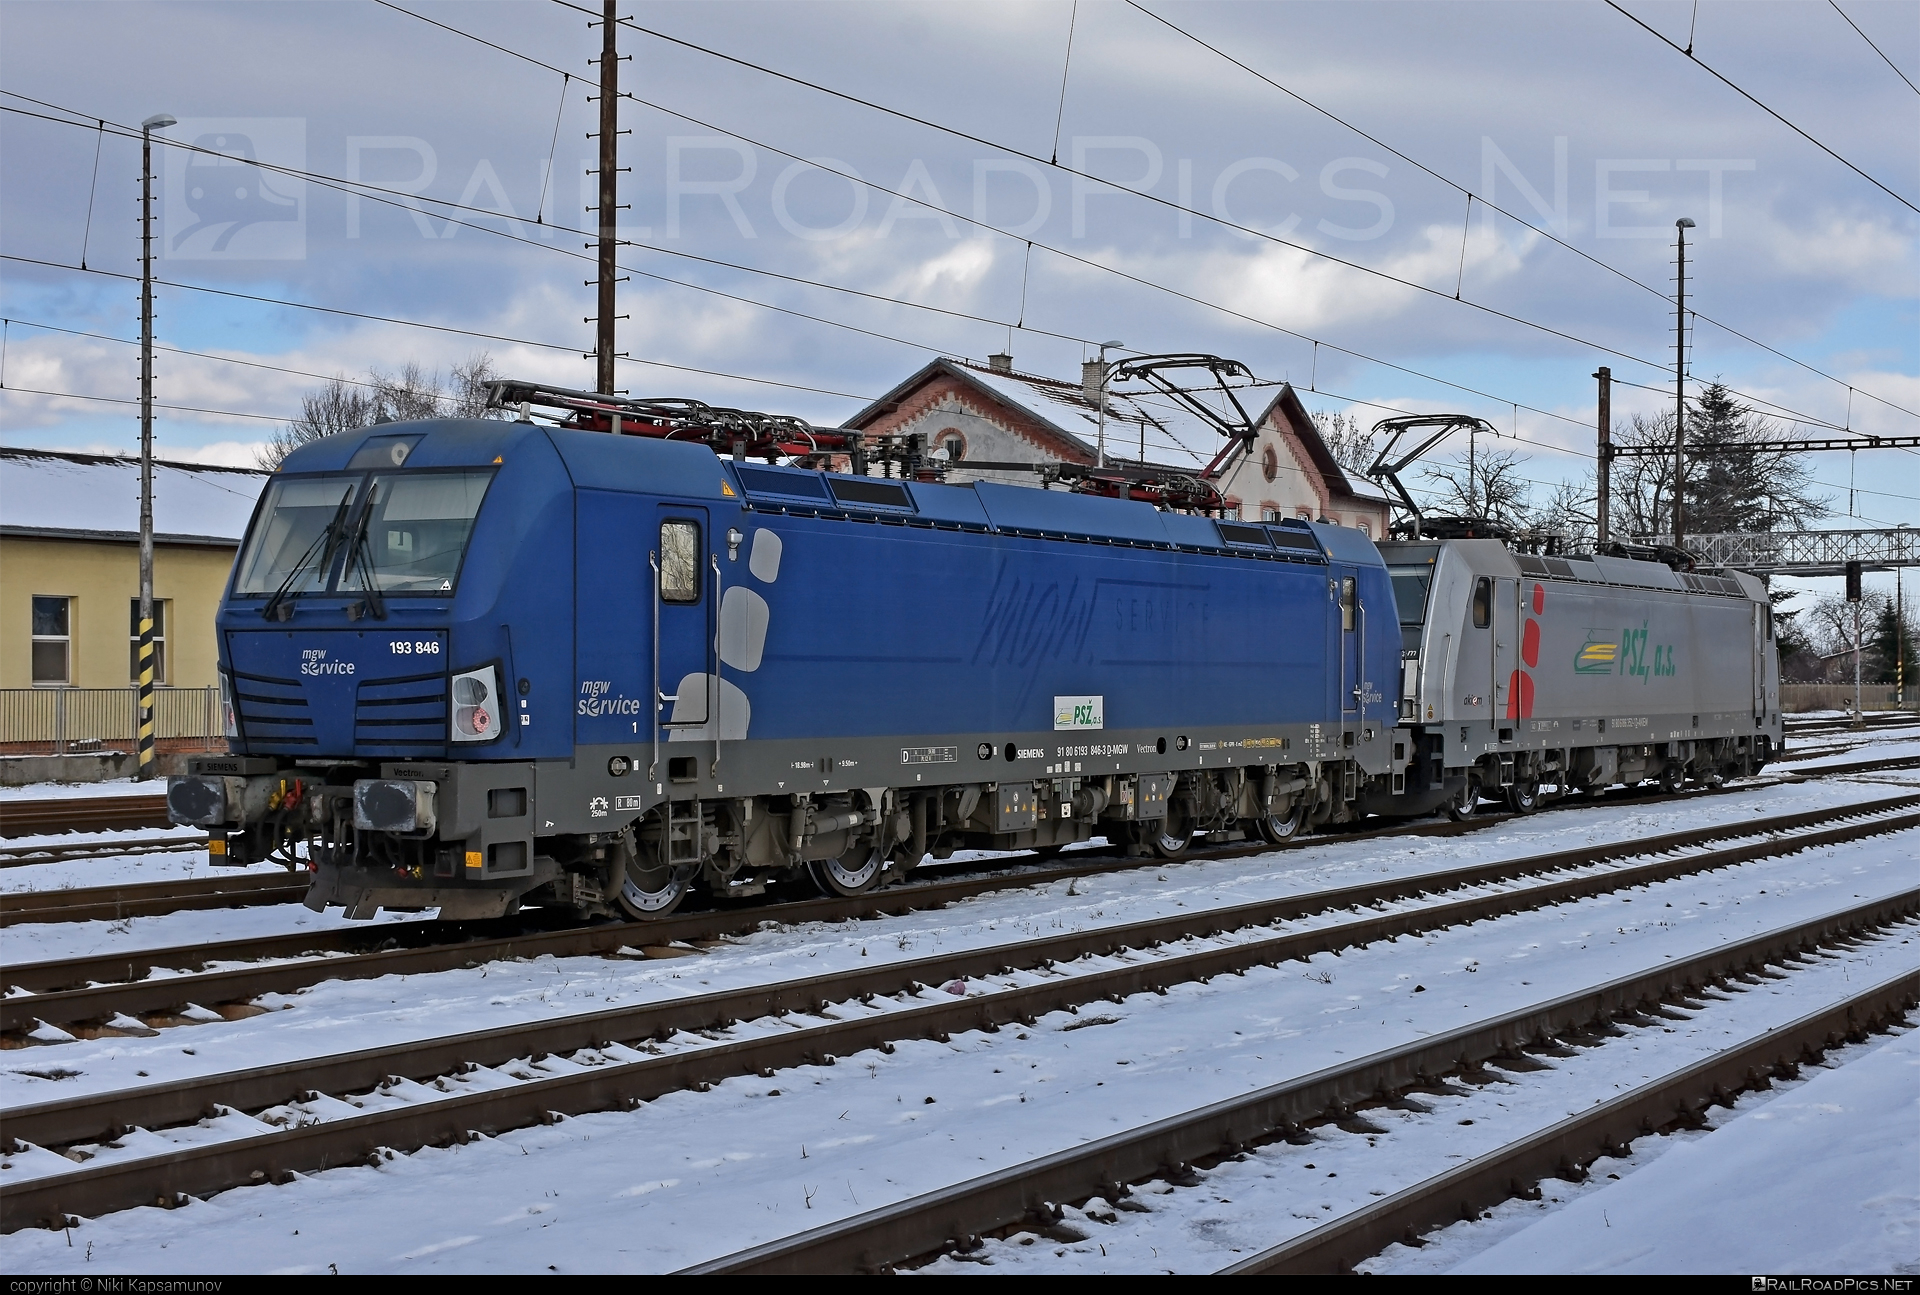 Siemens Vectron MS - 193 846 operated by Prvá Slovenská železničná, a.s. #mgw #mgwServiceGmbH #prvaslovenskazeleznicna #prvaslovenskazeleznicnaas #psz #siemens #siemensvectron #siemensvectronms #vectron #vectronms